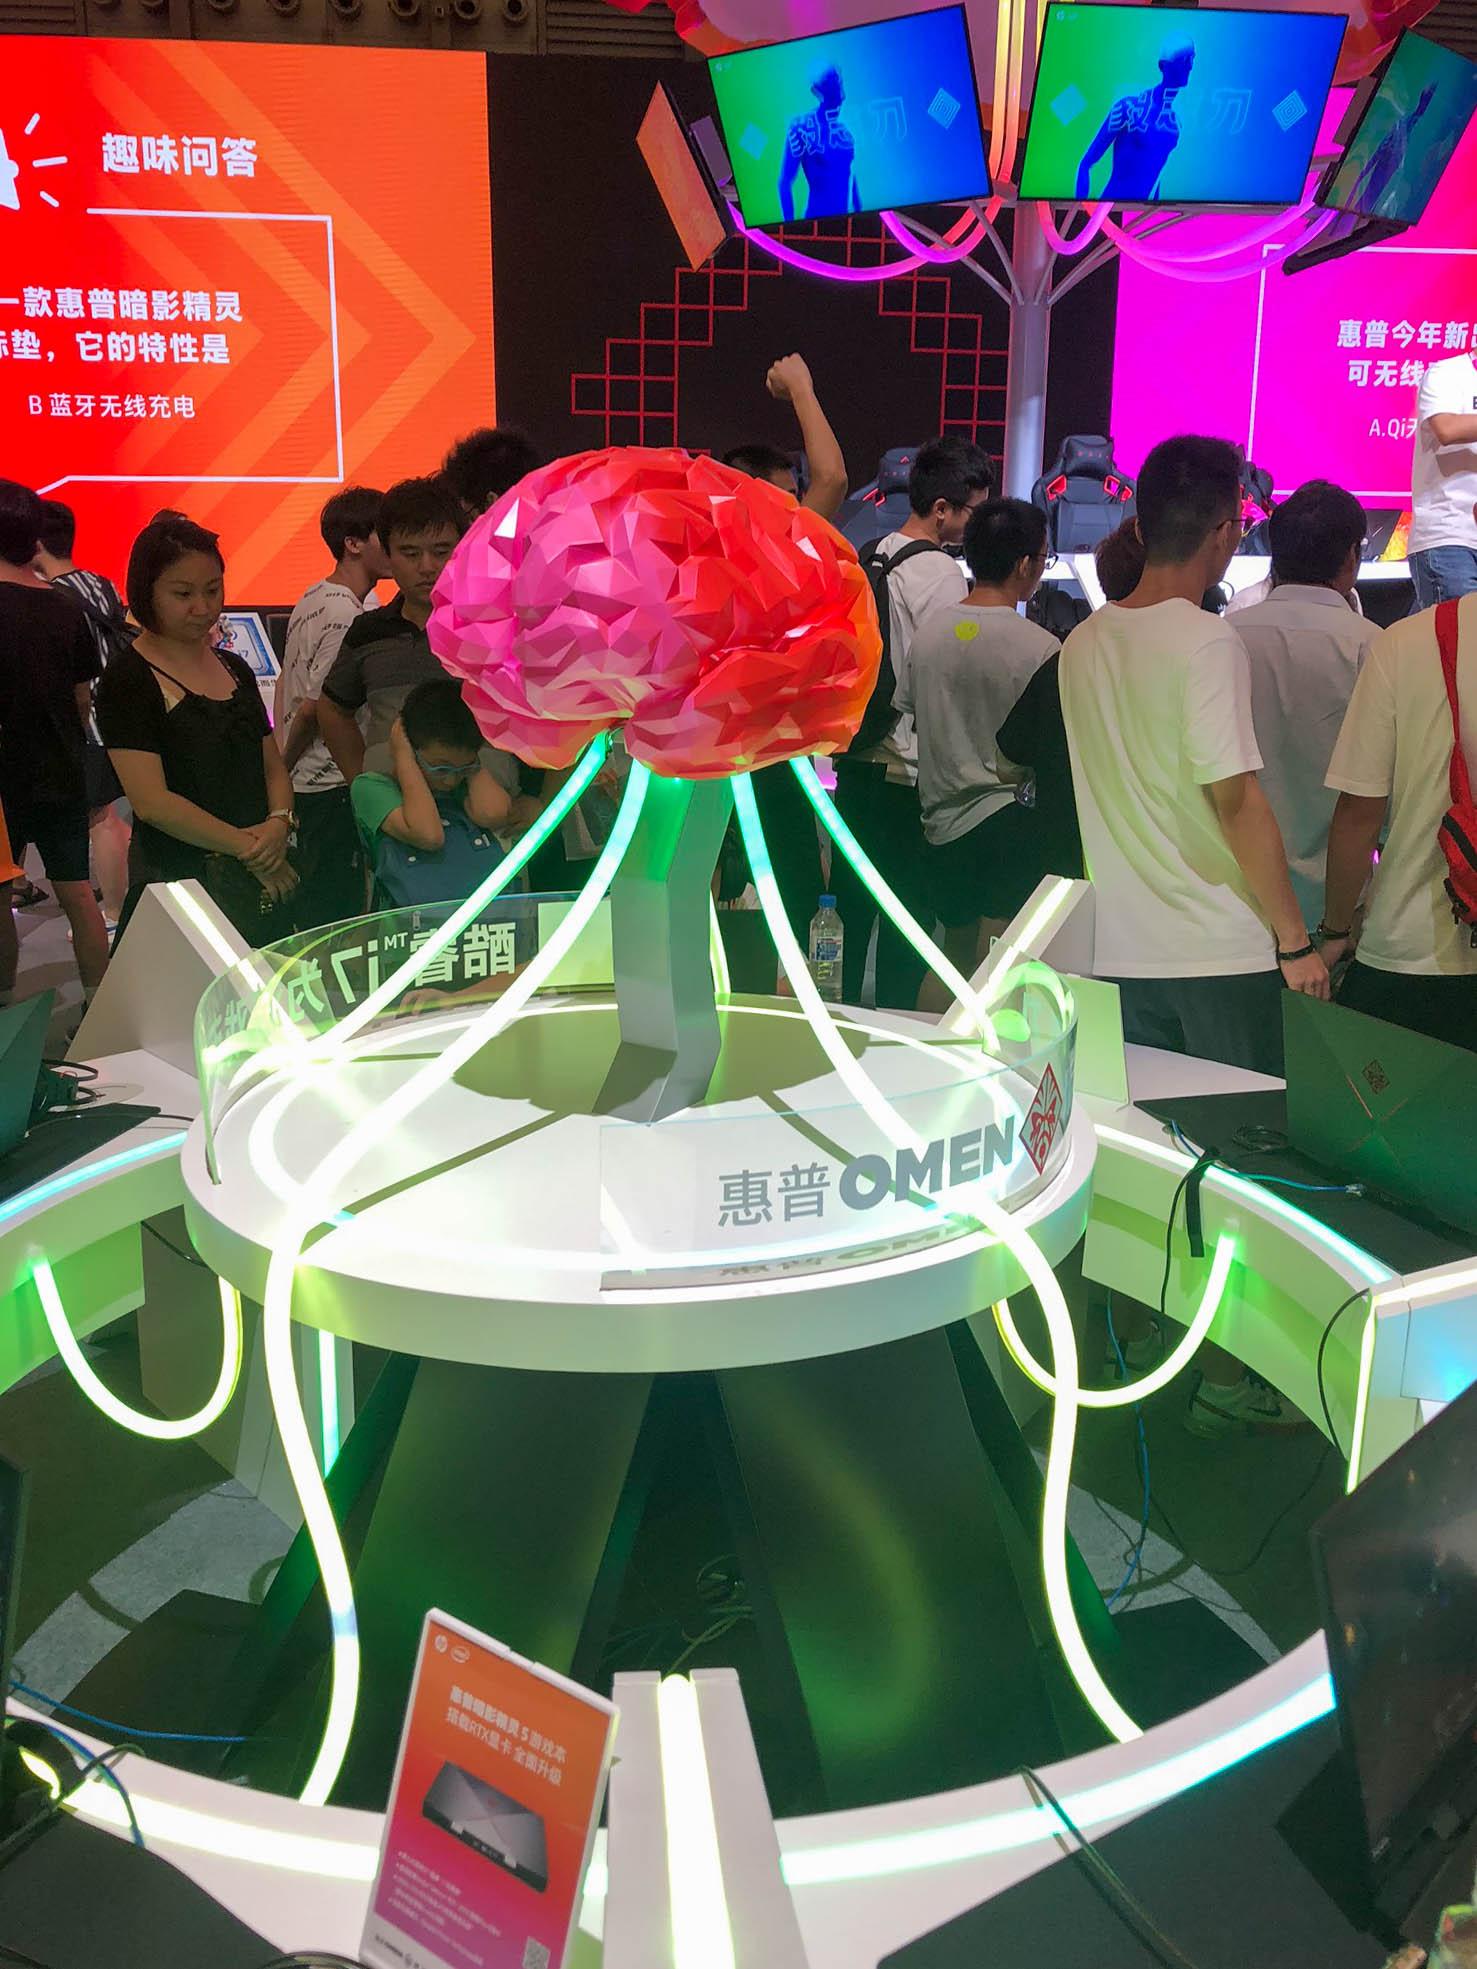 2019 ChinaJoy 中国国际数码互动娱乐展览会 游玩 第13张